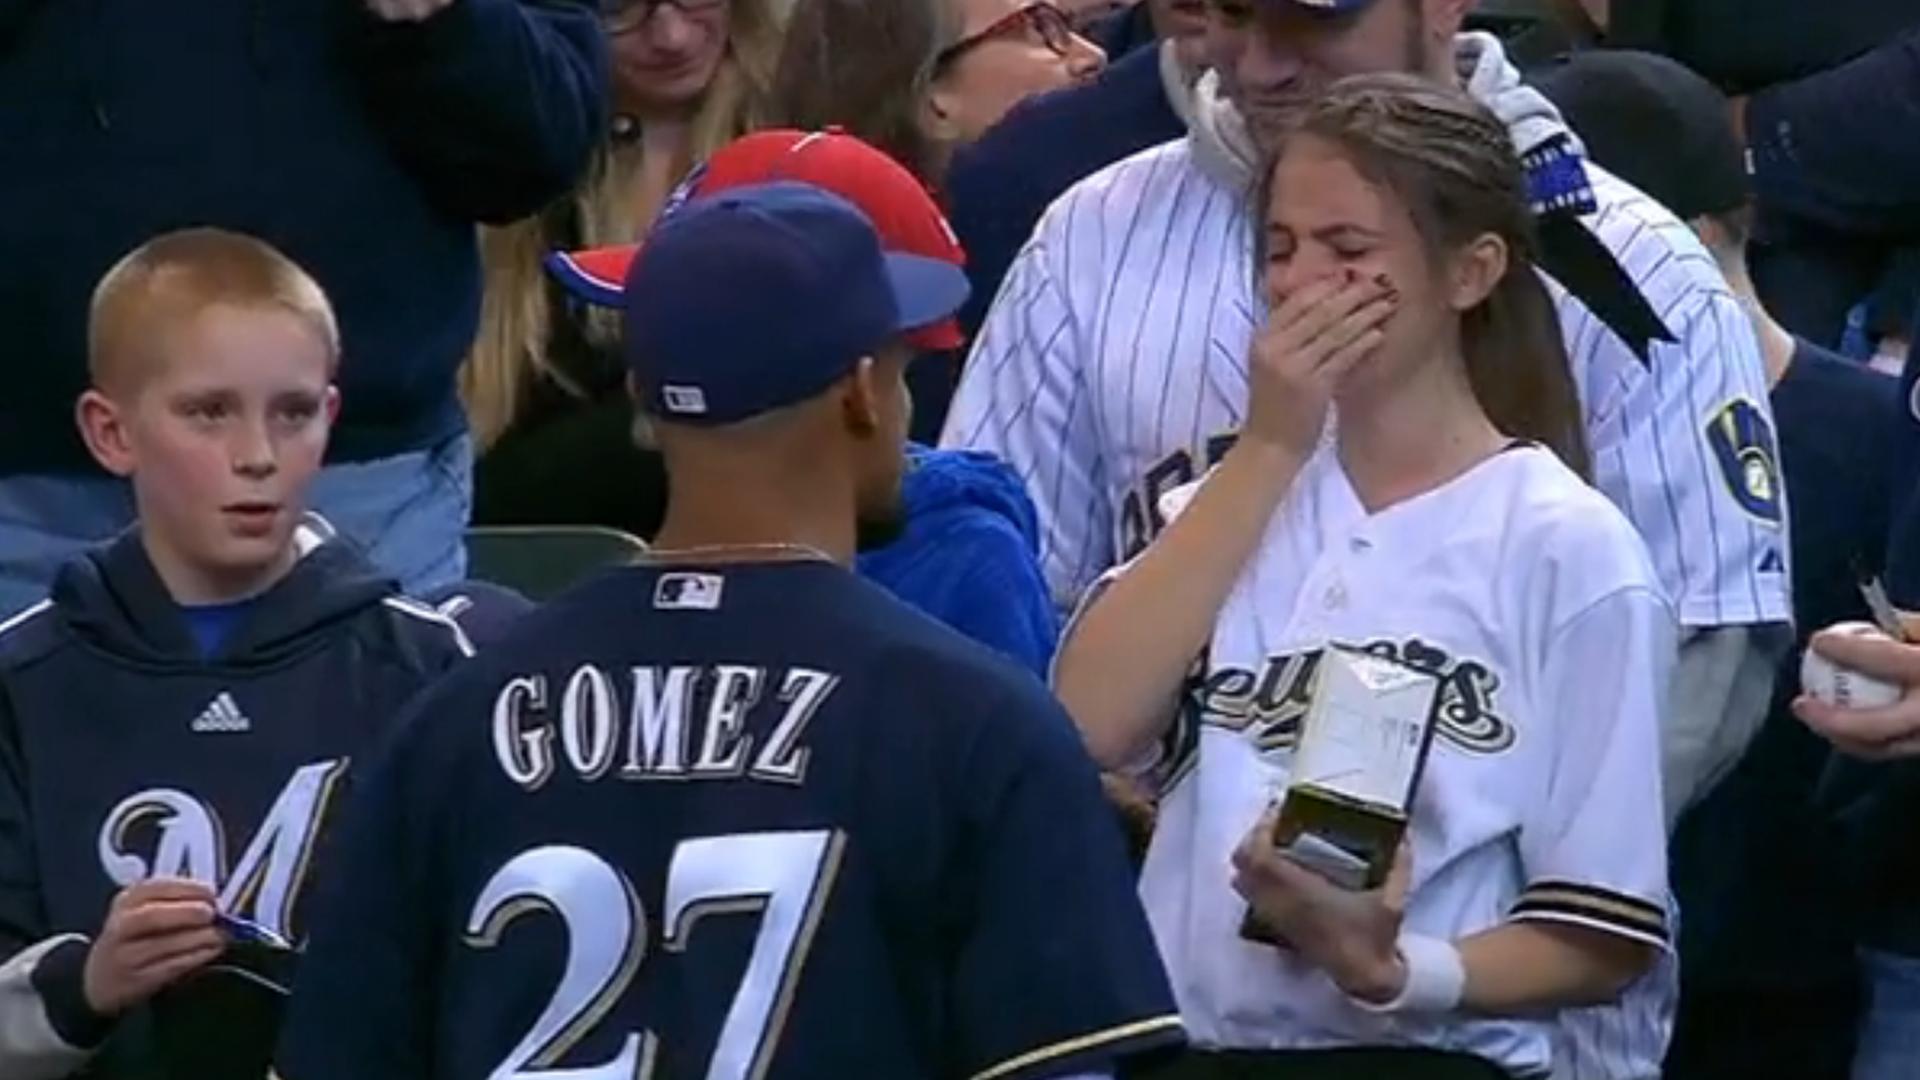 Gomez and fan